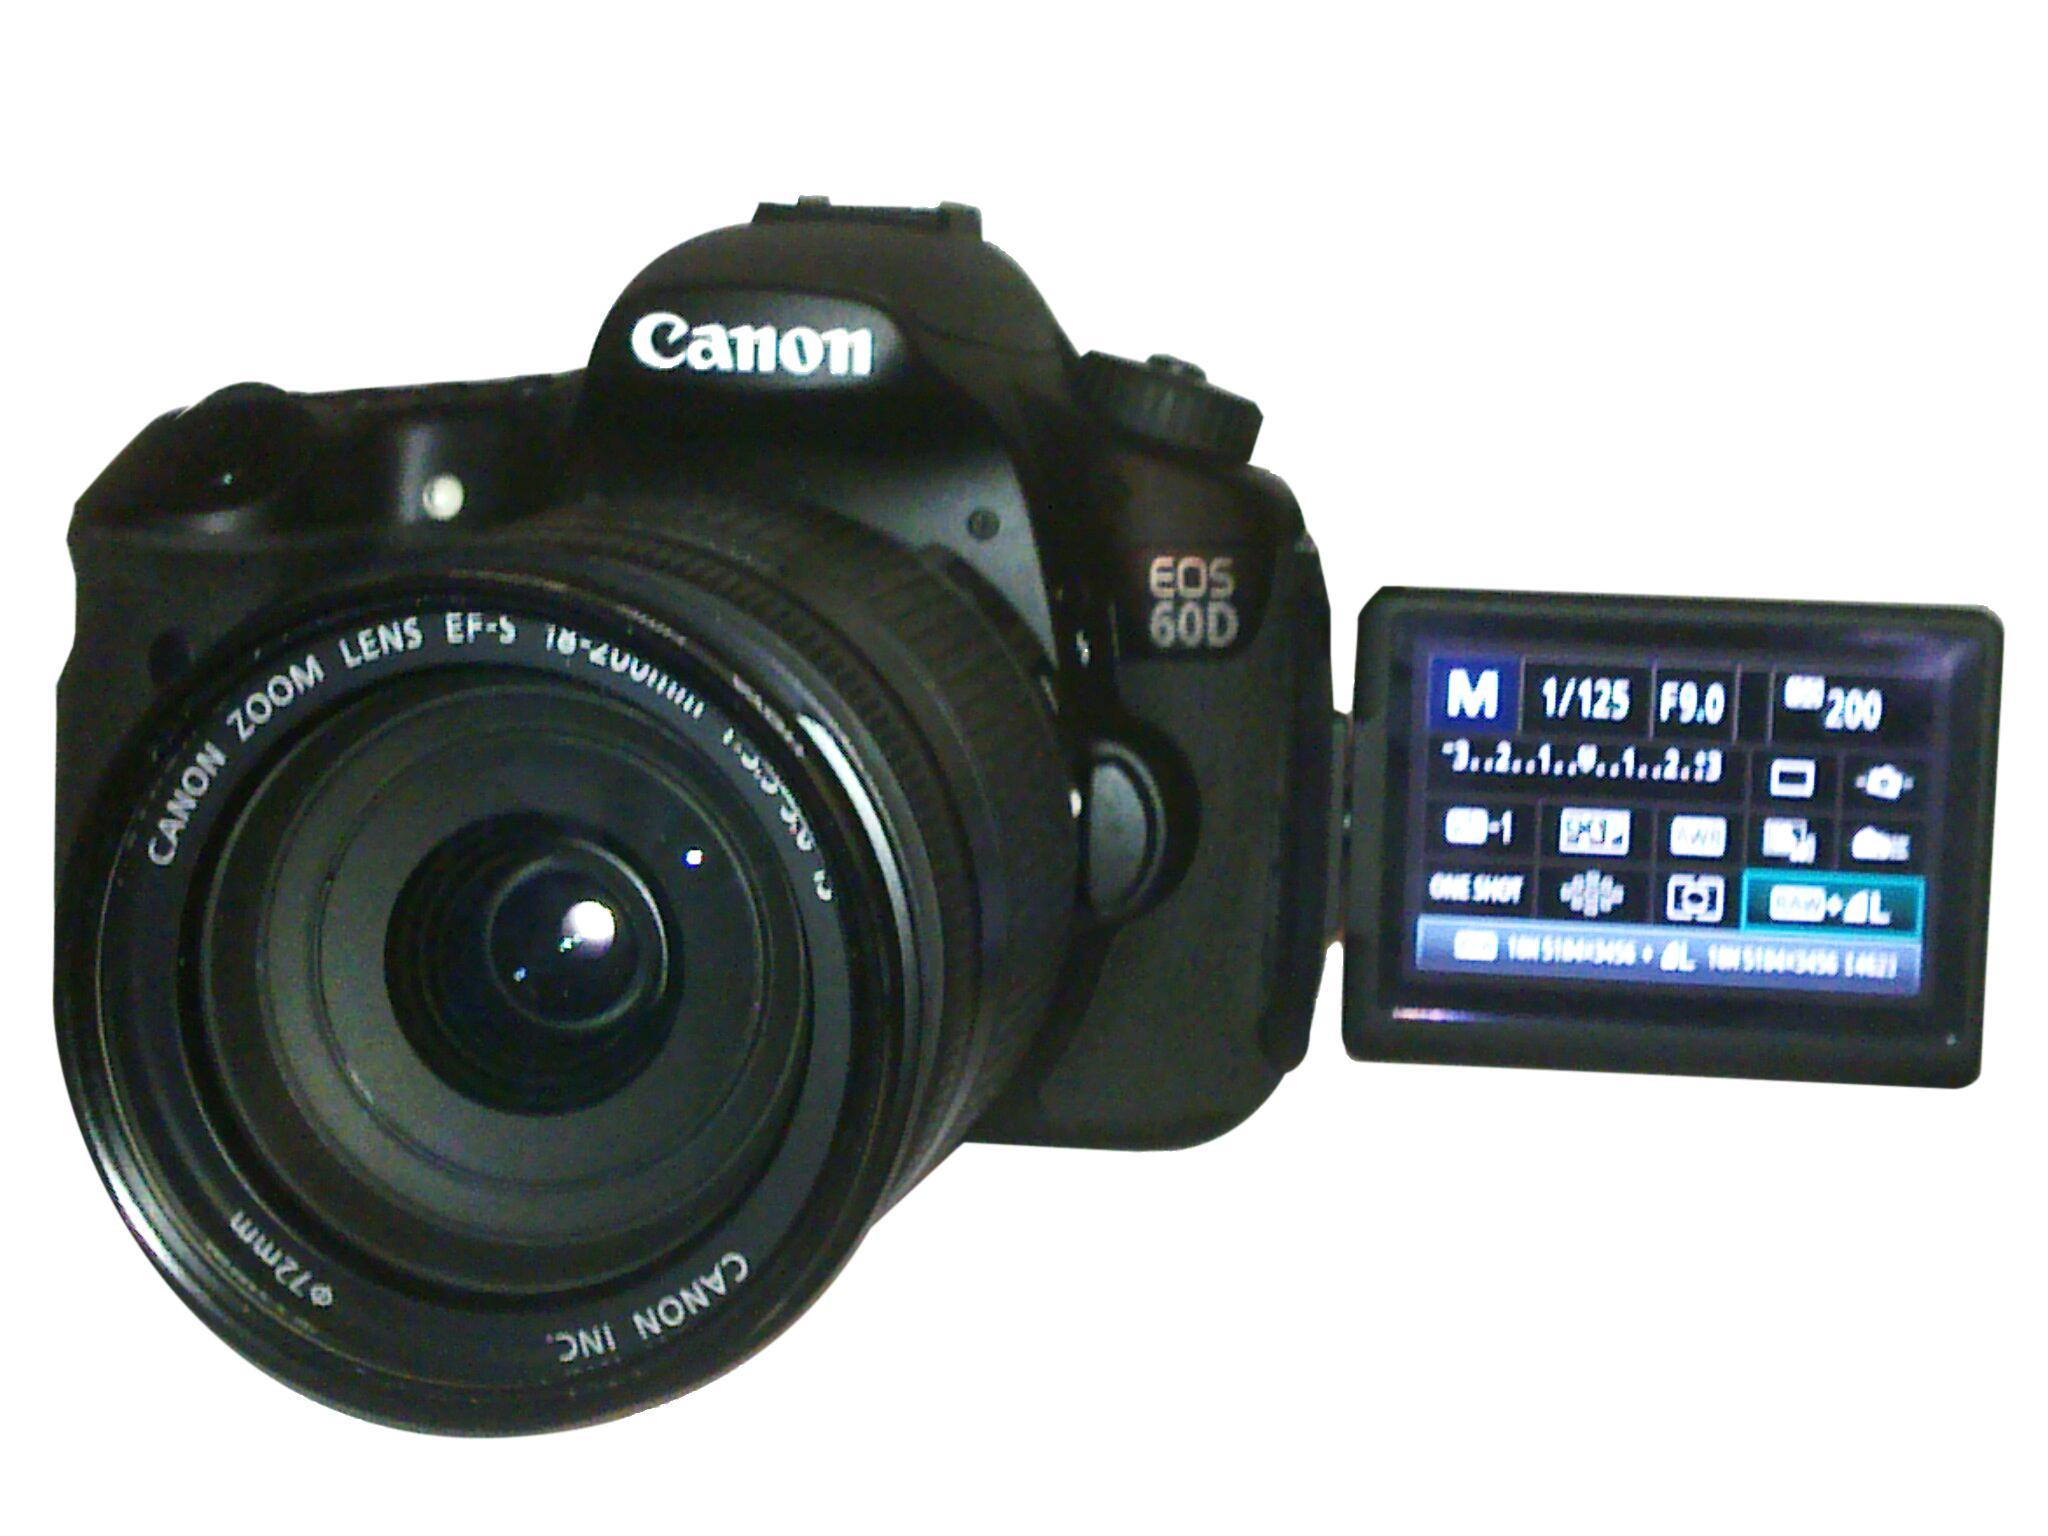 Camera Canon Dslr Camera 60d filecamera canon eos 60d photo front jpg wikimedia commons jpg